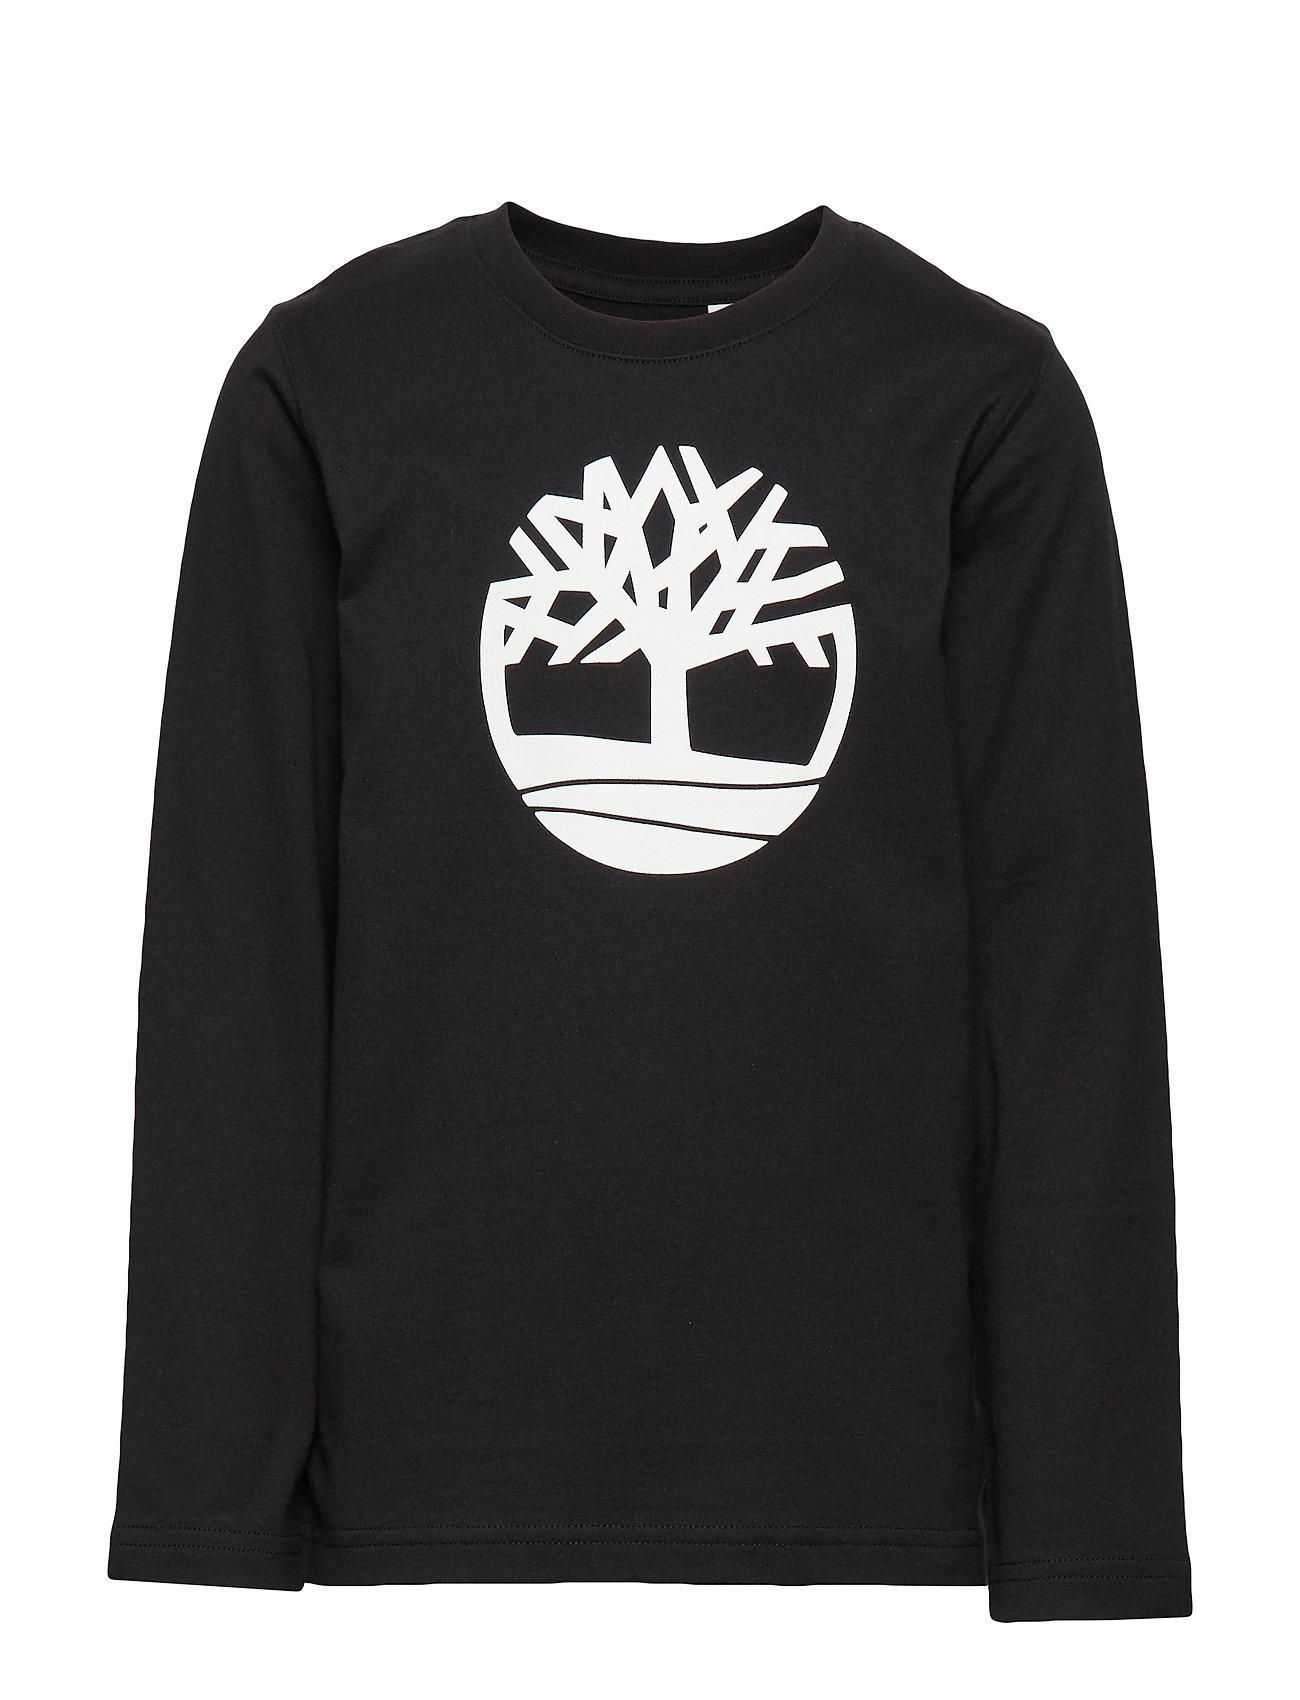 Timberland LONG SLEEVE T-SHIRT - BLACK